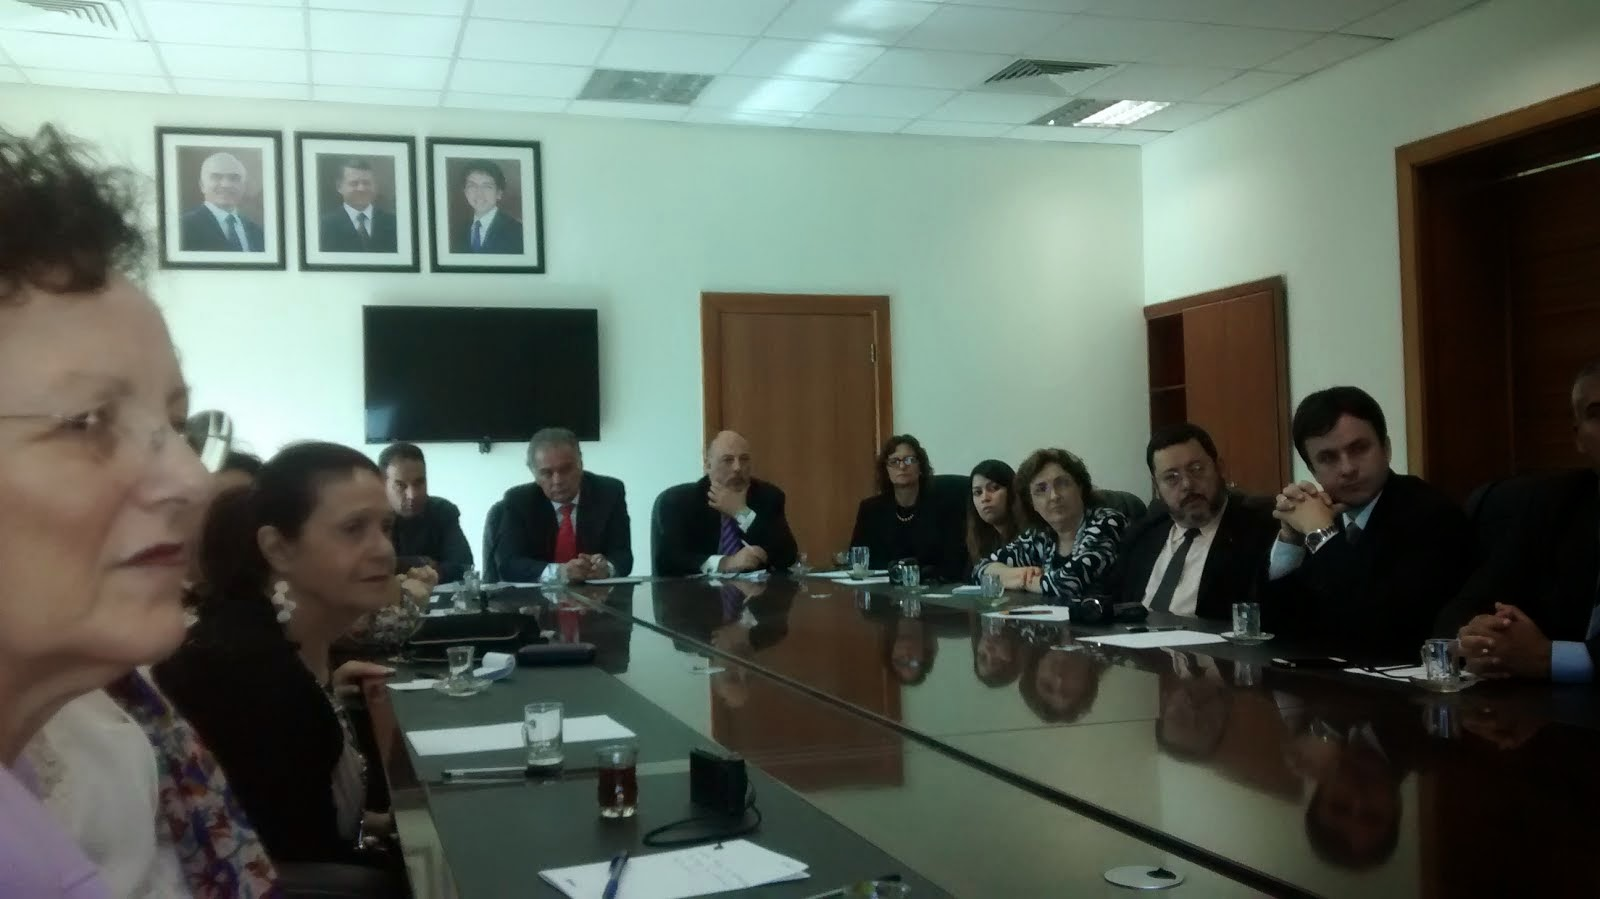 Exposición del Prof. Faisal Al Rfouh, ex Ministro de Cultura del Reino de Jordania